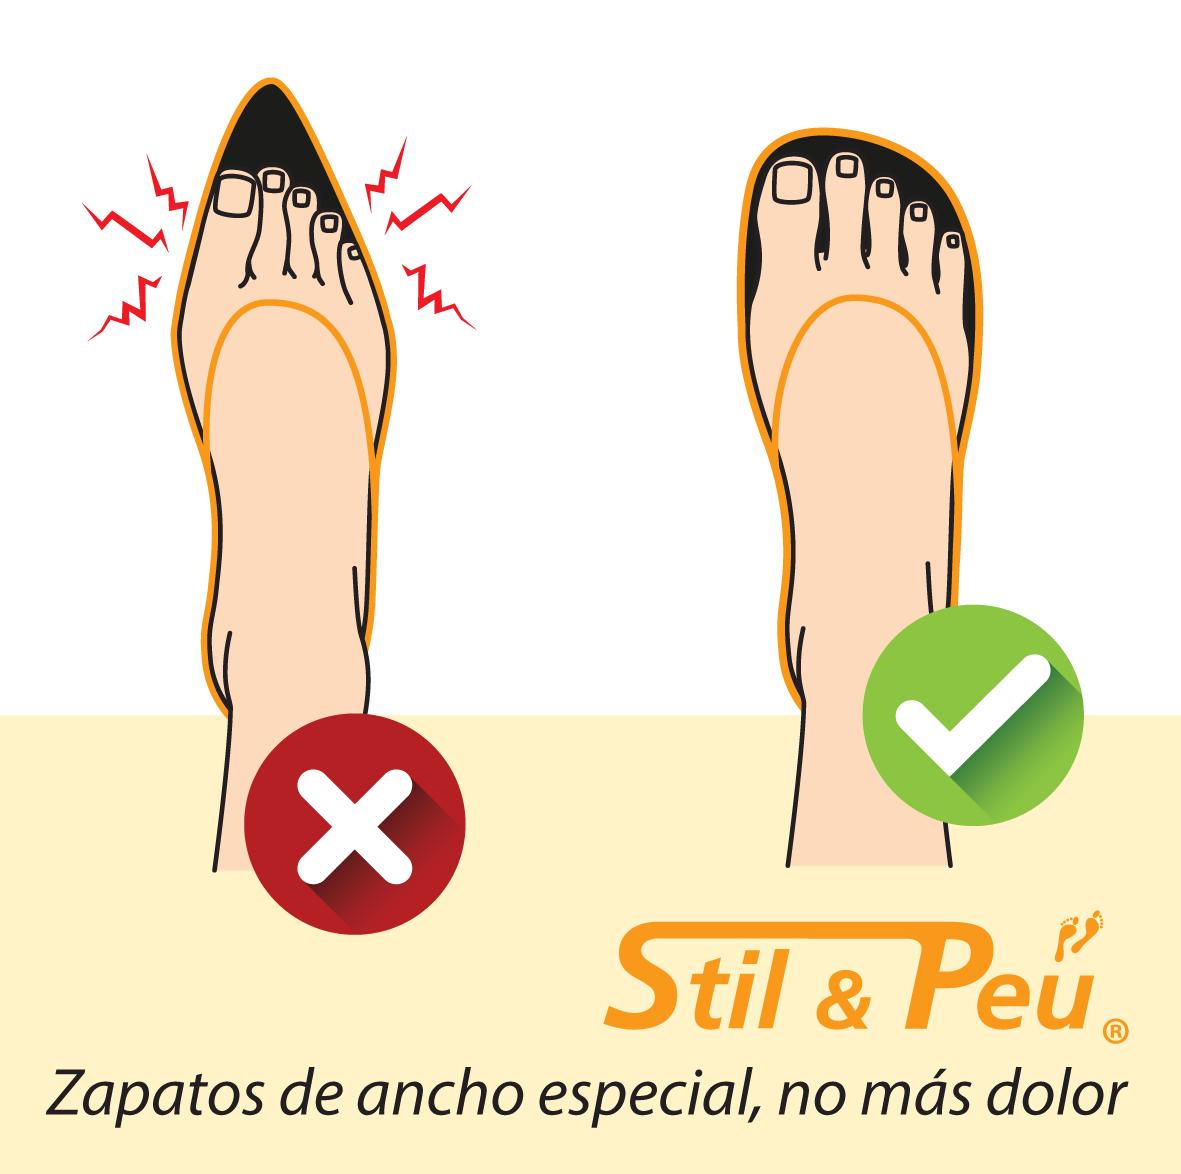 Zapatos de ancho especial consejos